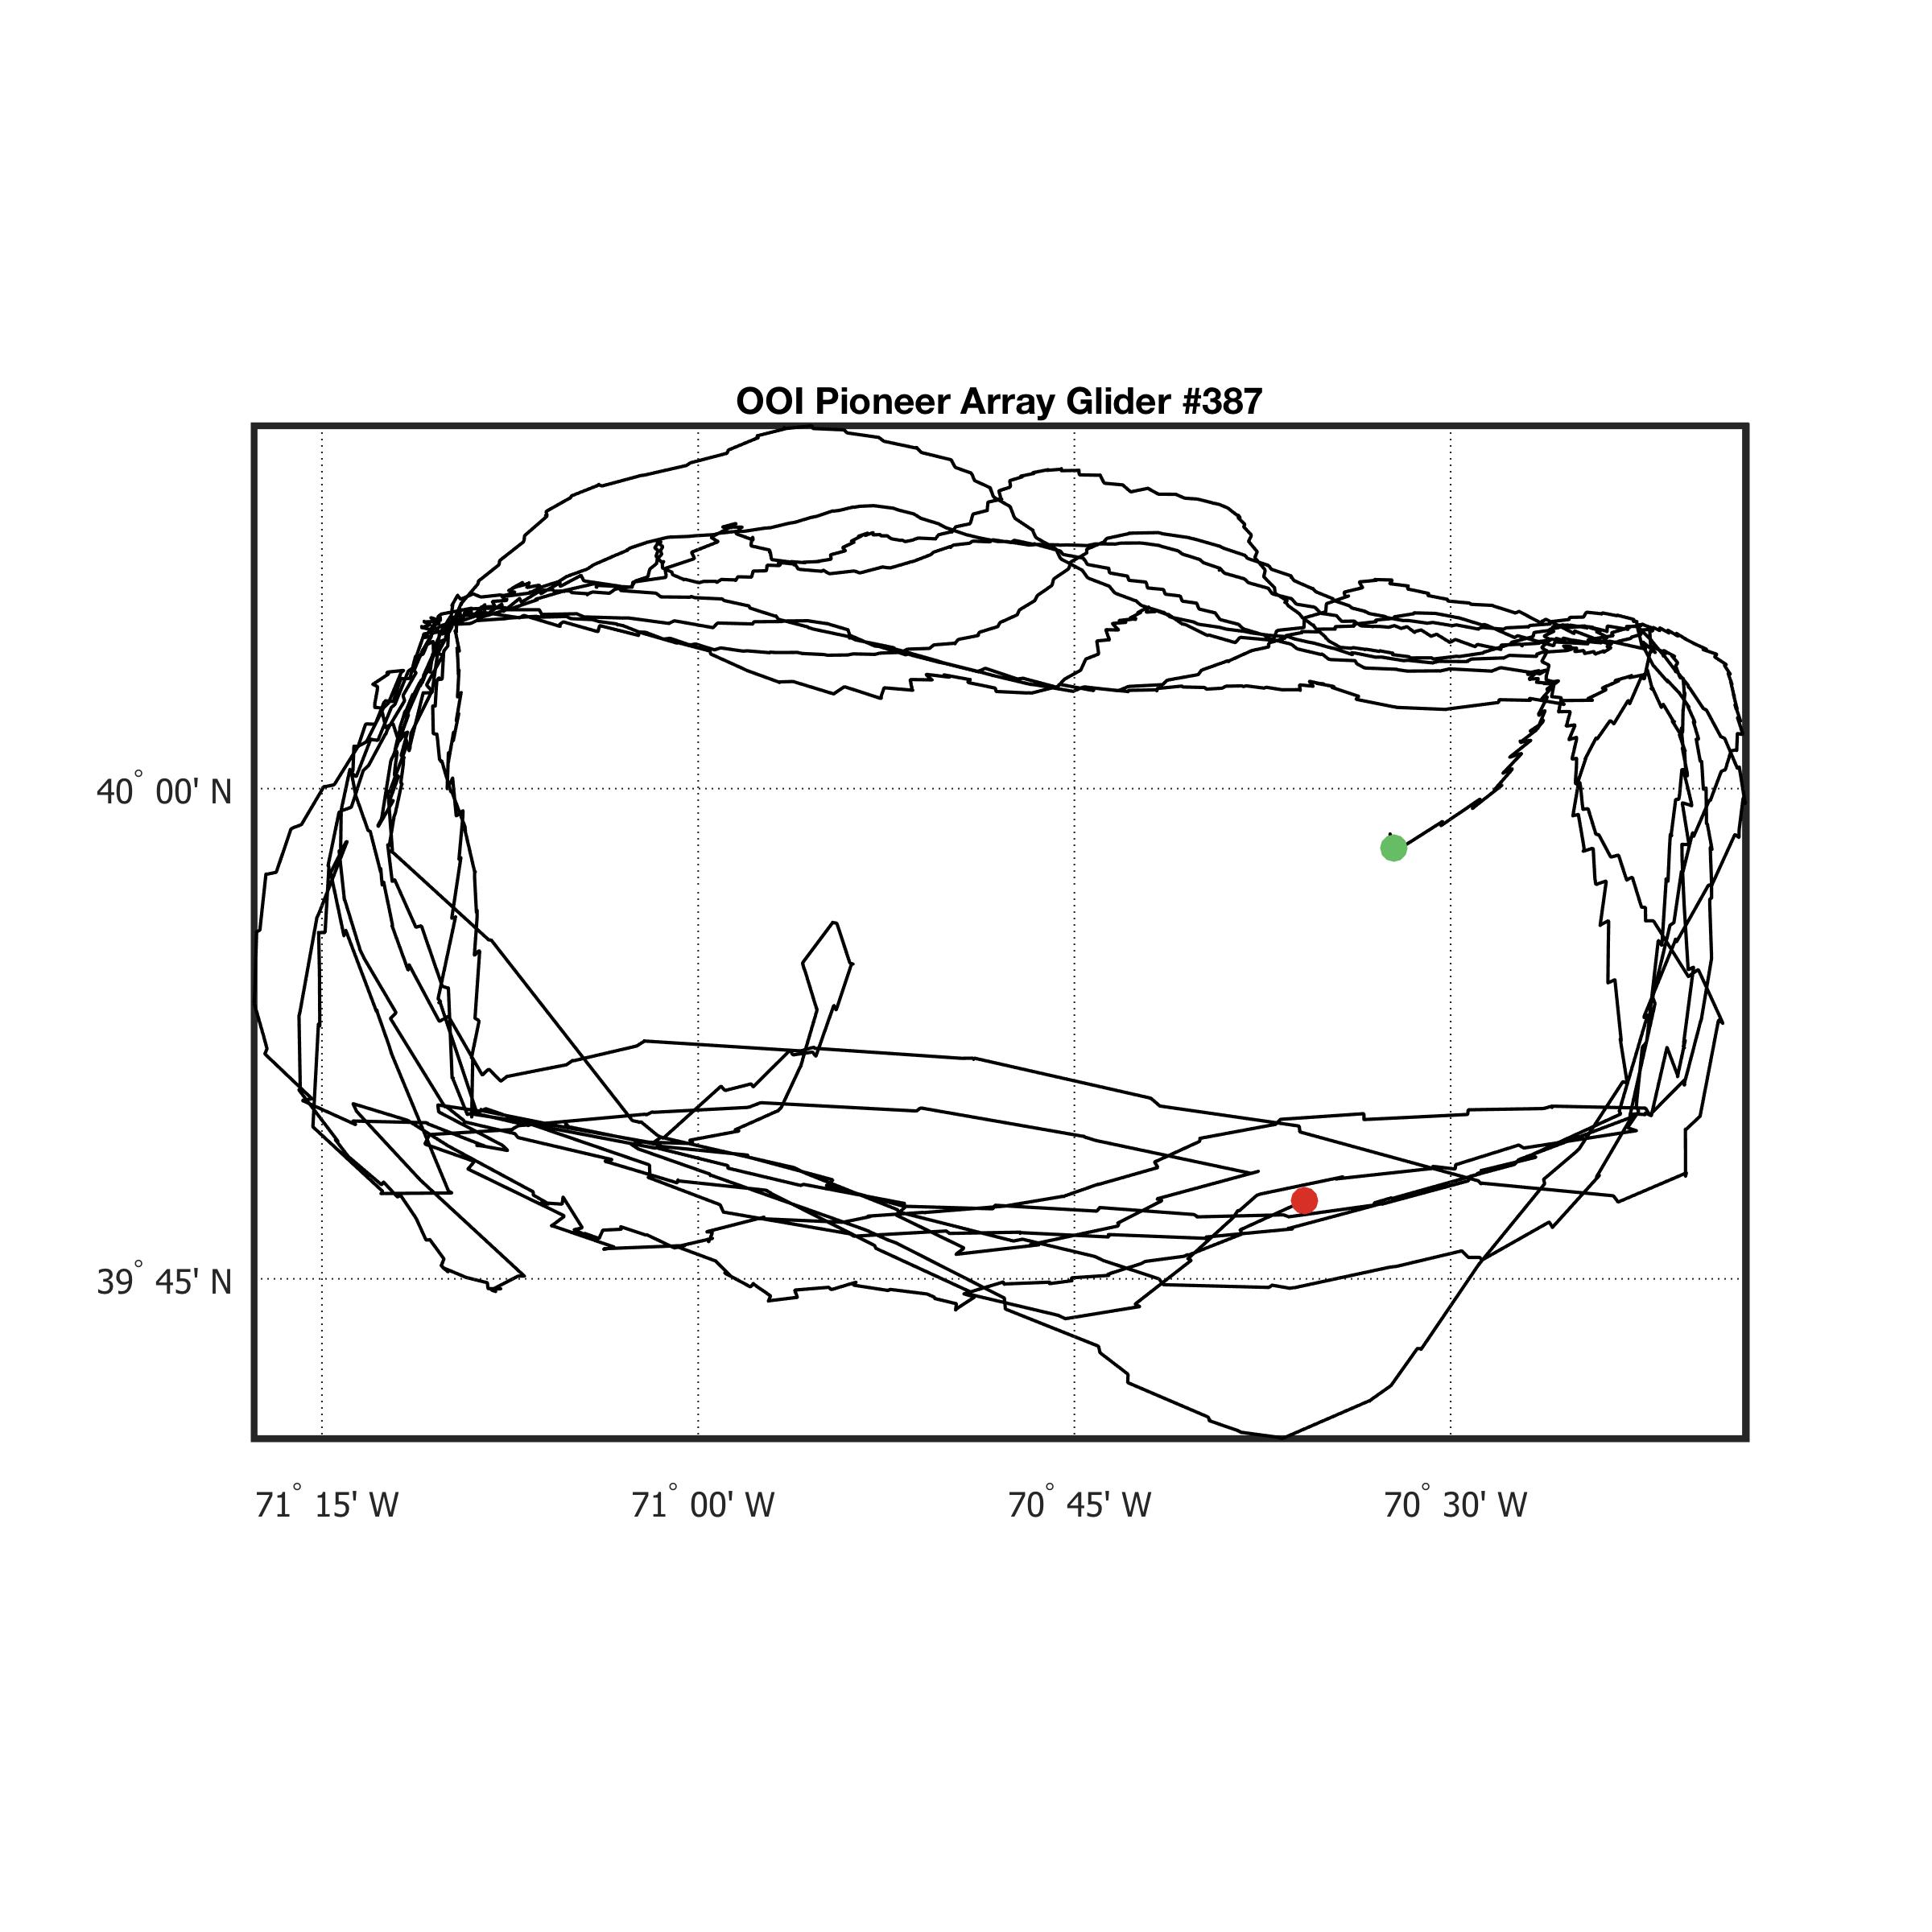 Making a Glider Deployment Map in Matlab | Ocean